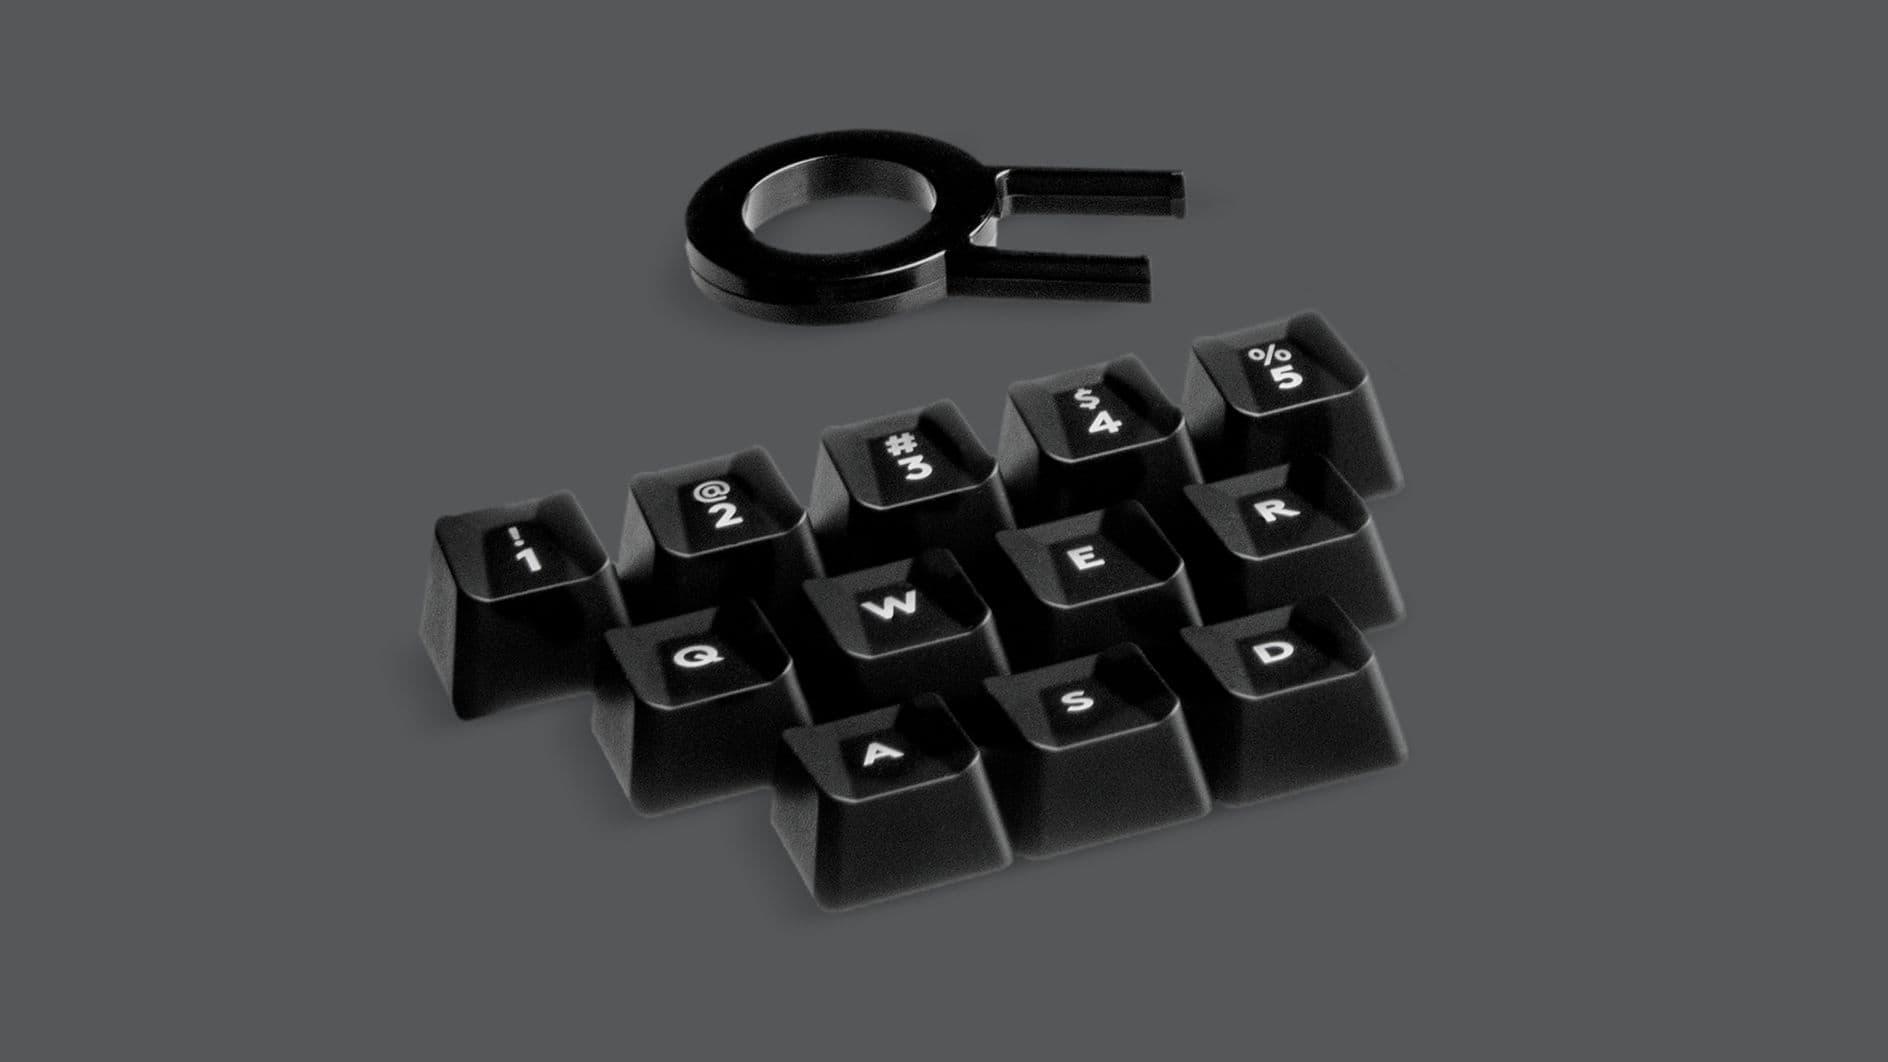 additional keycaps